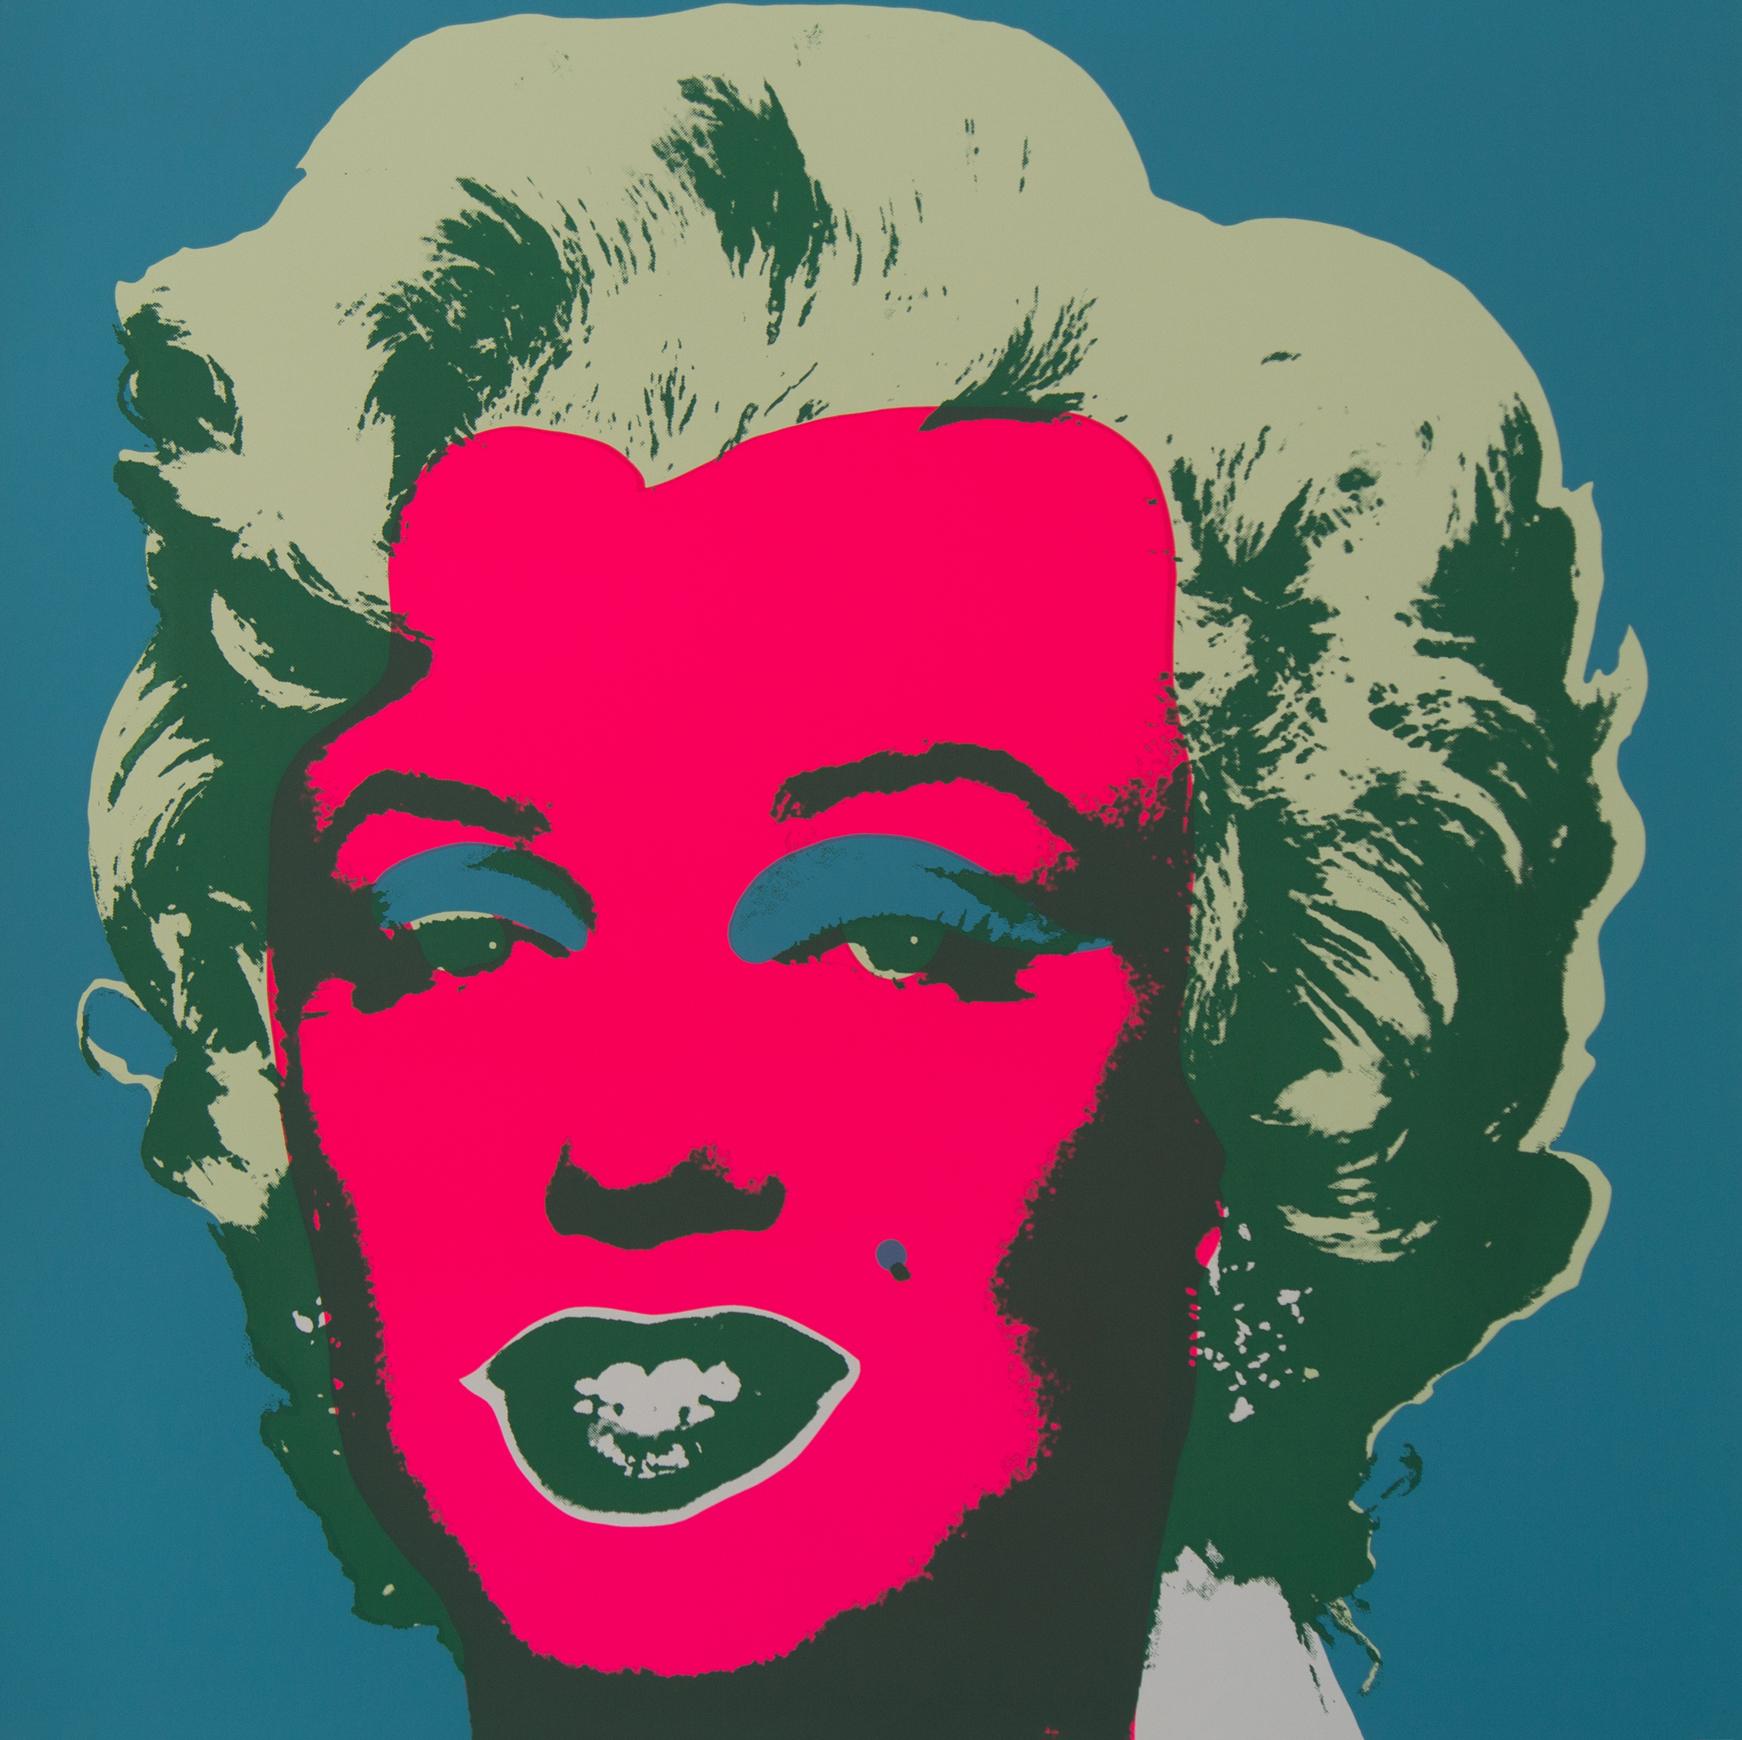 11.30: Marilyn Monroe